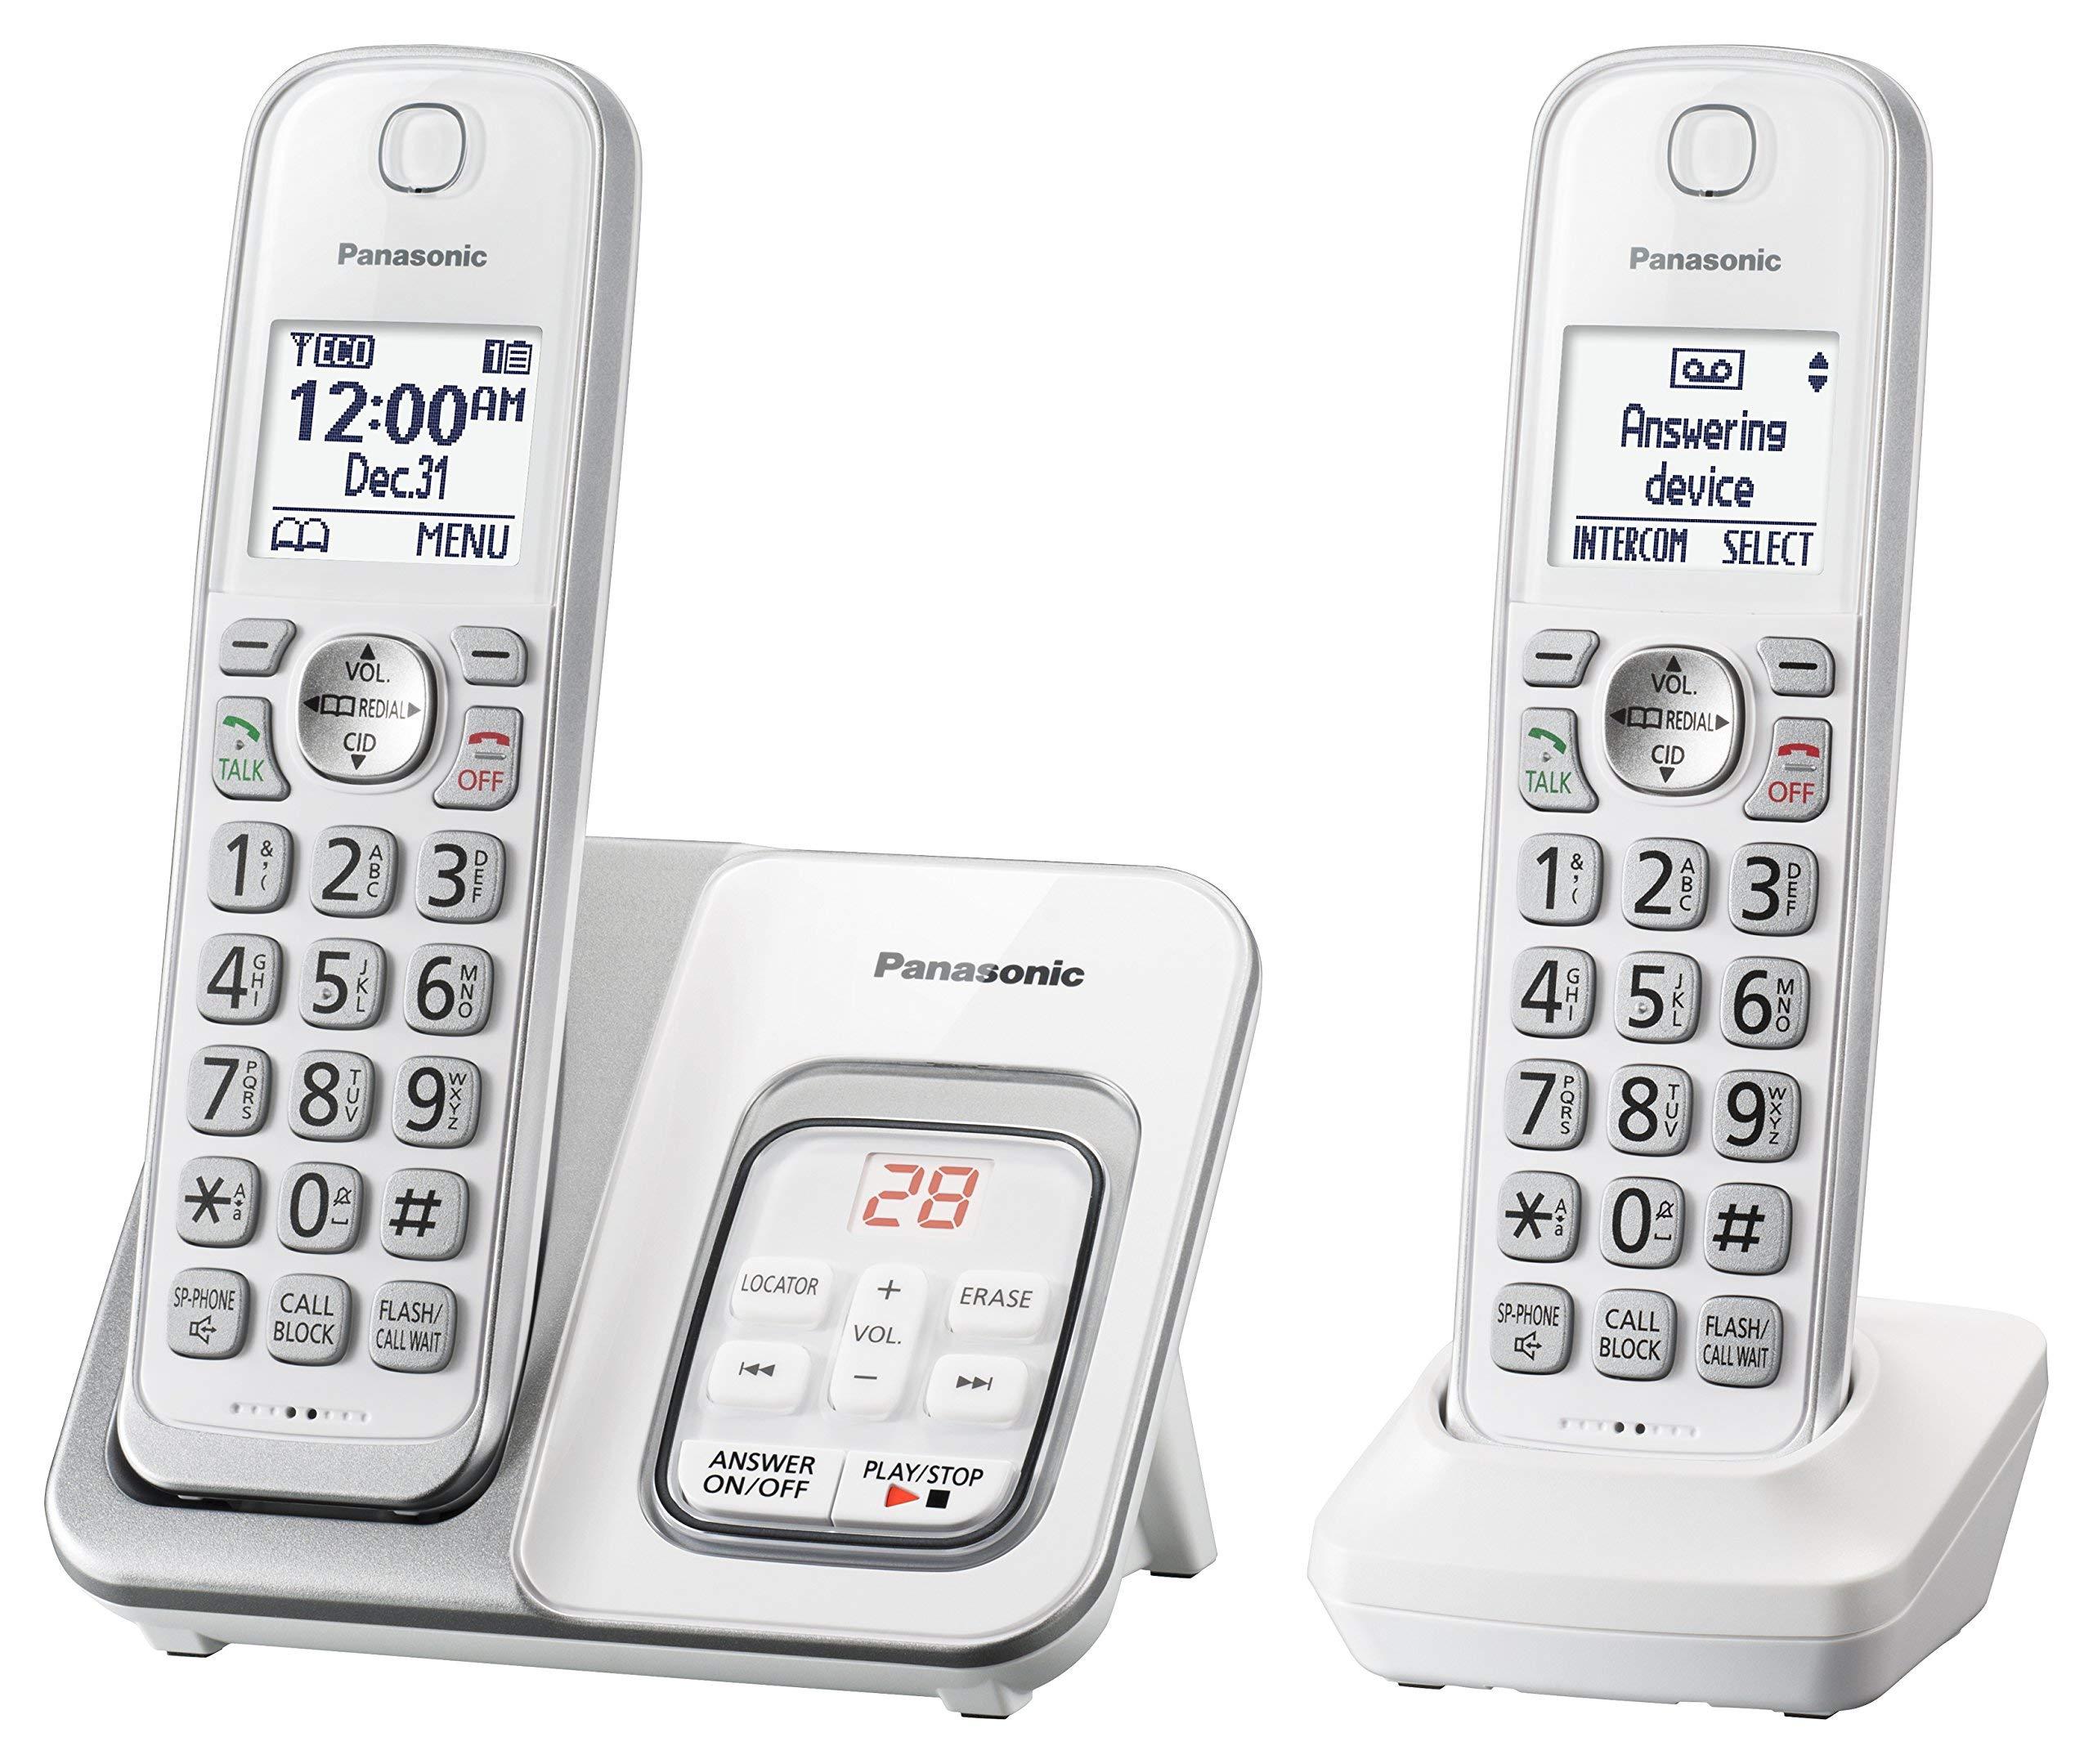 Amazon Com Panasonic Kx Tgd532w Cordless Phone With Answering Machine 2 Handsets Renewed Office Products